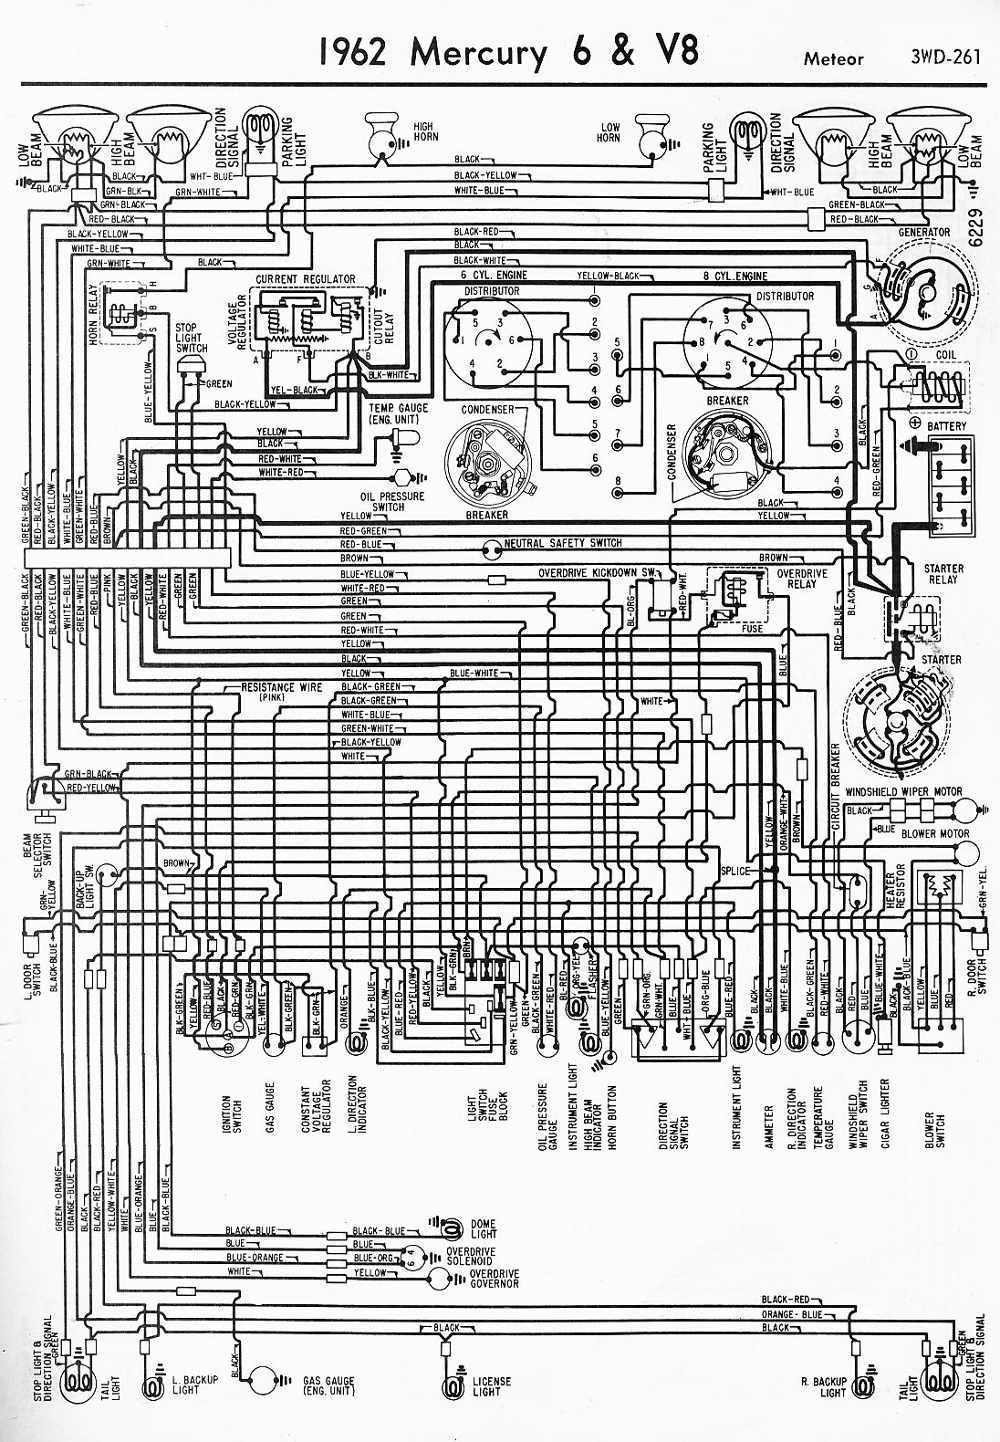 49 Mercury Wiring Related Keywords Suggestions Verado Harness Efi Diagram